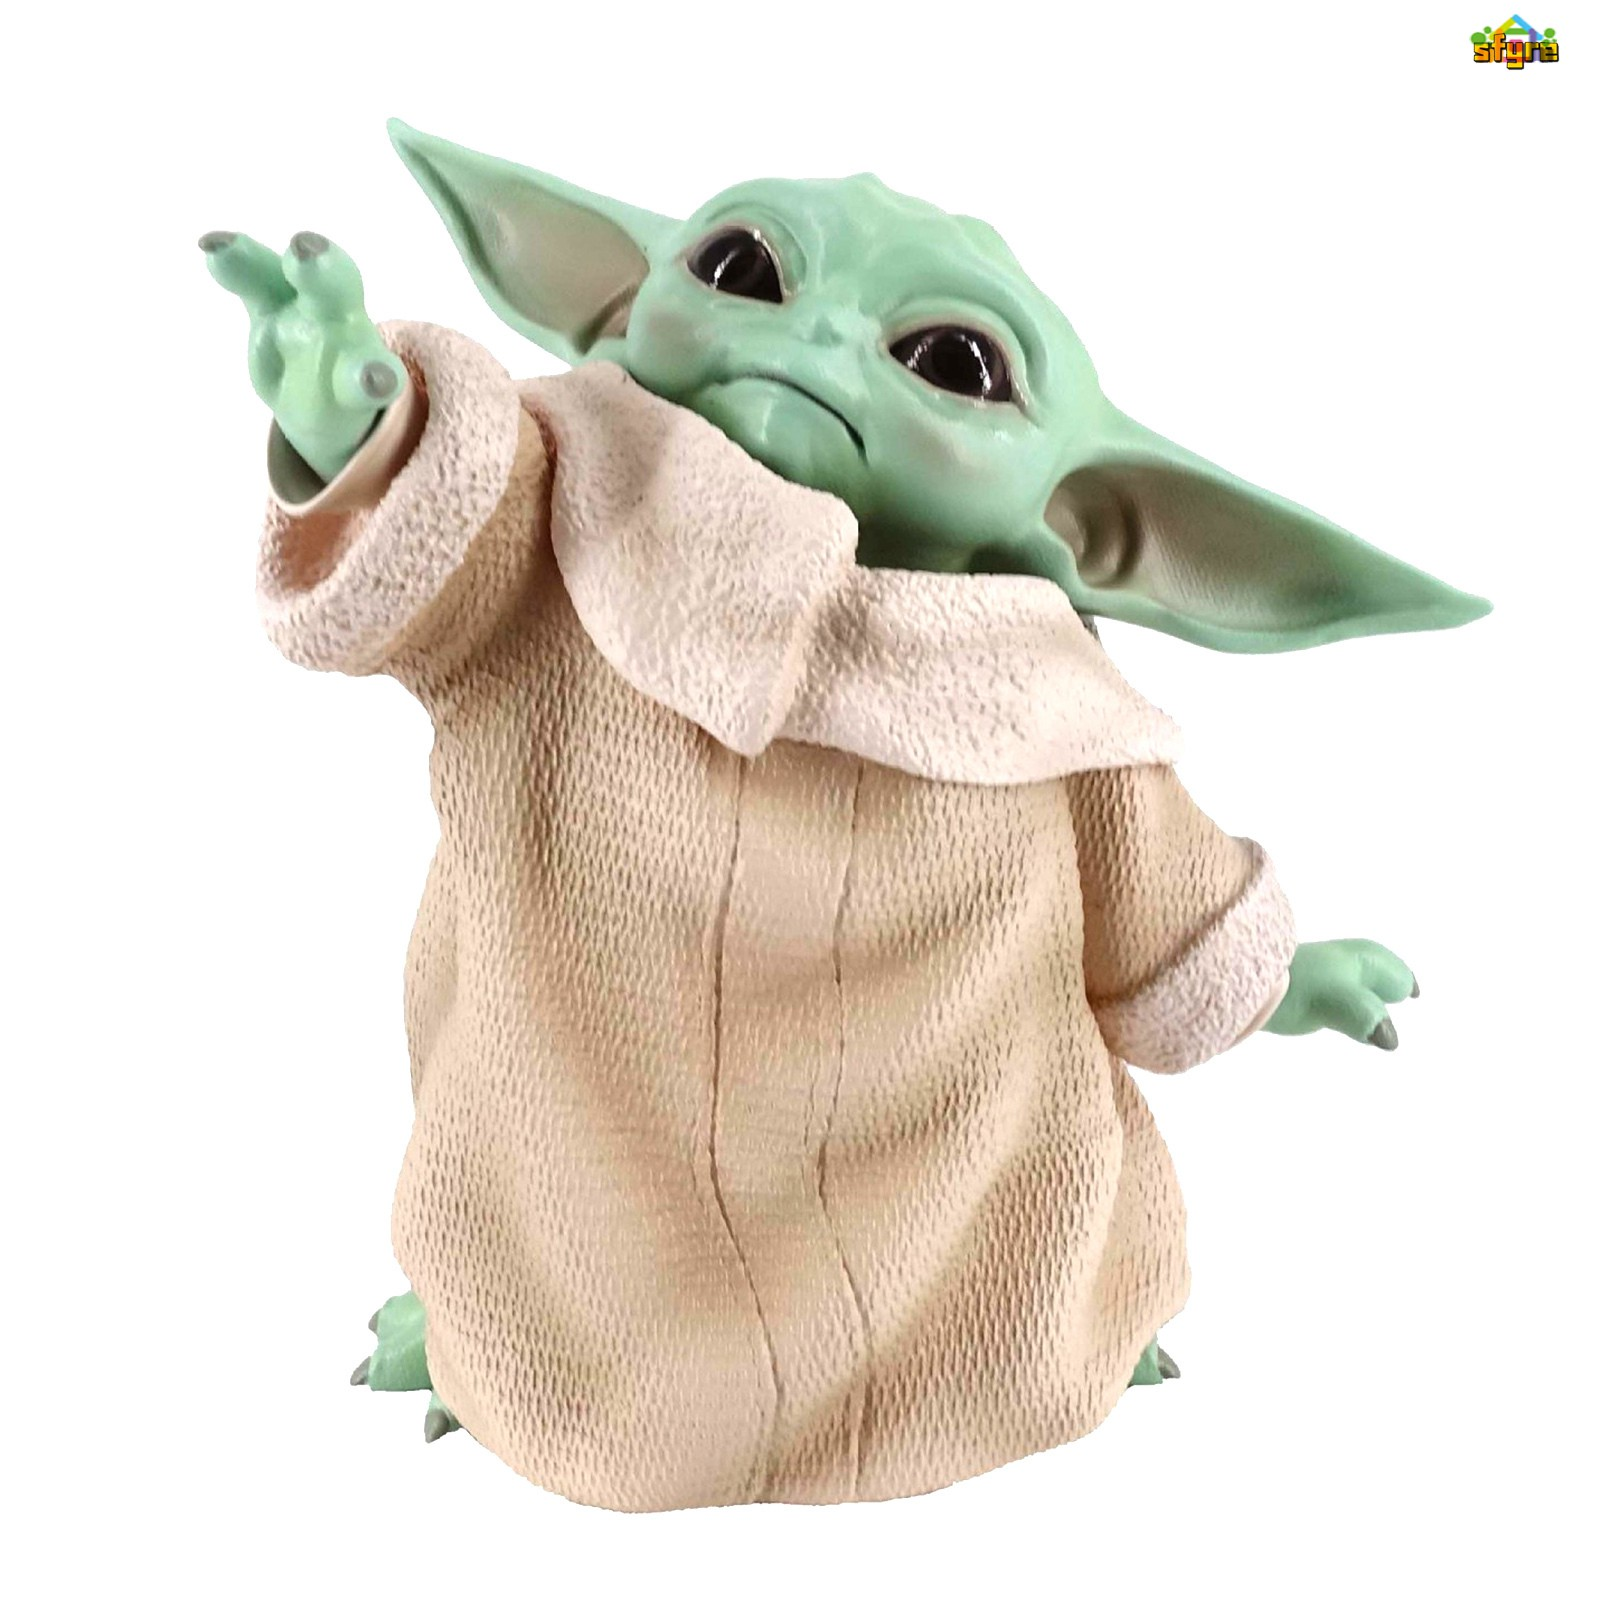 Sfyre Mandalorian War Star Little Baby YODA Ornaments Statue Figure Toys Gift for Kids